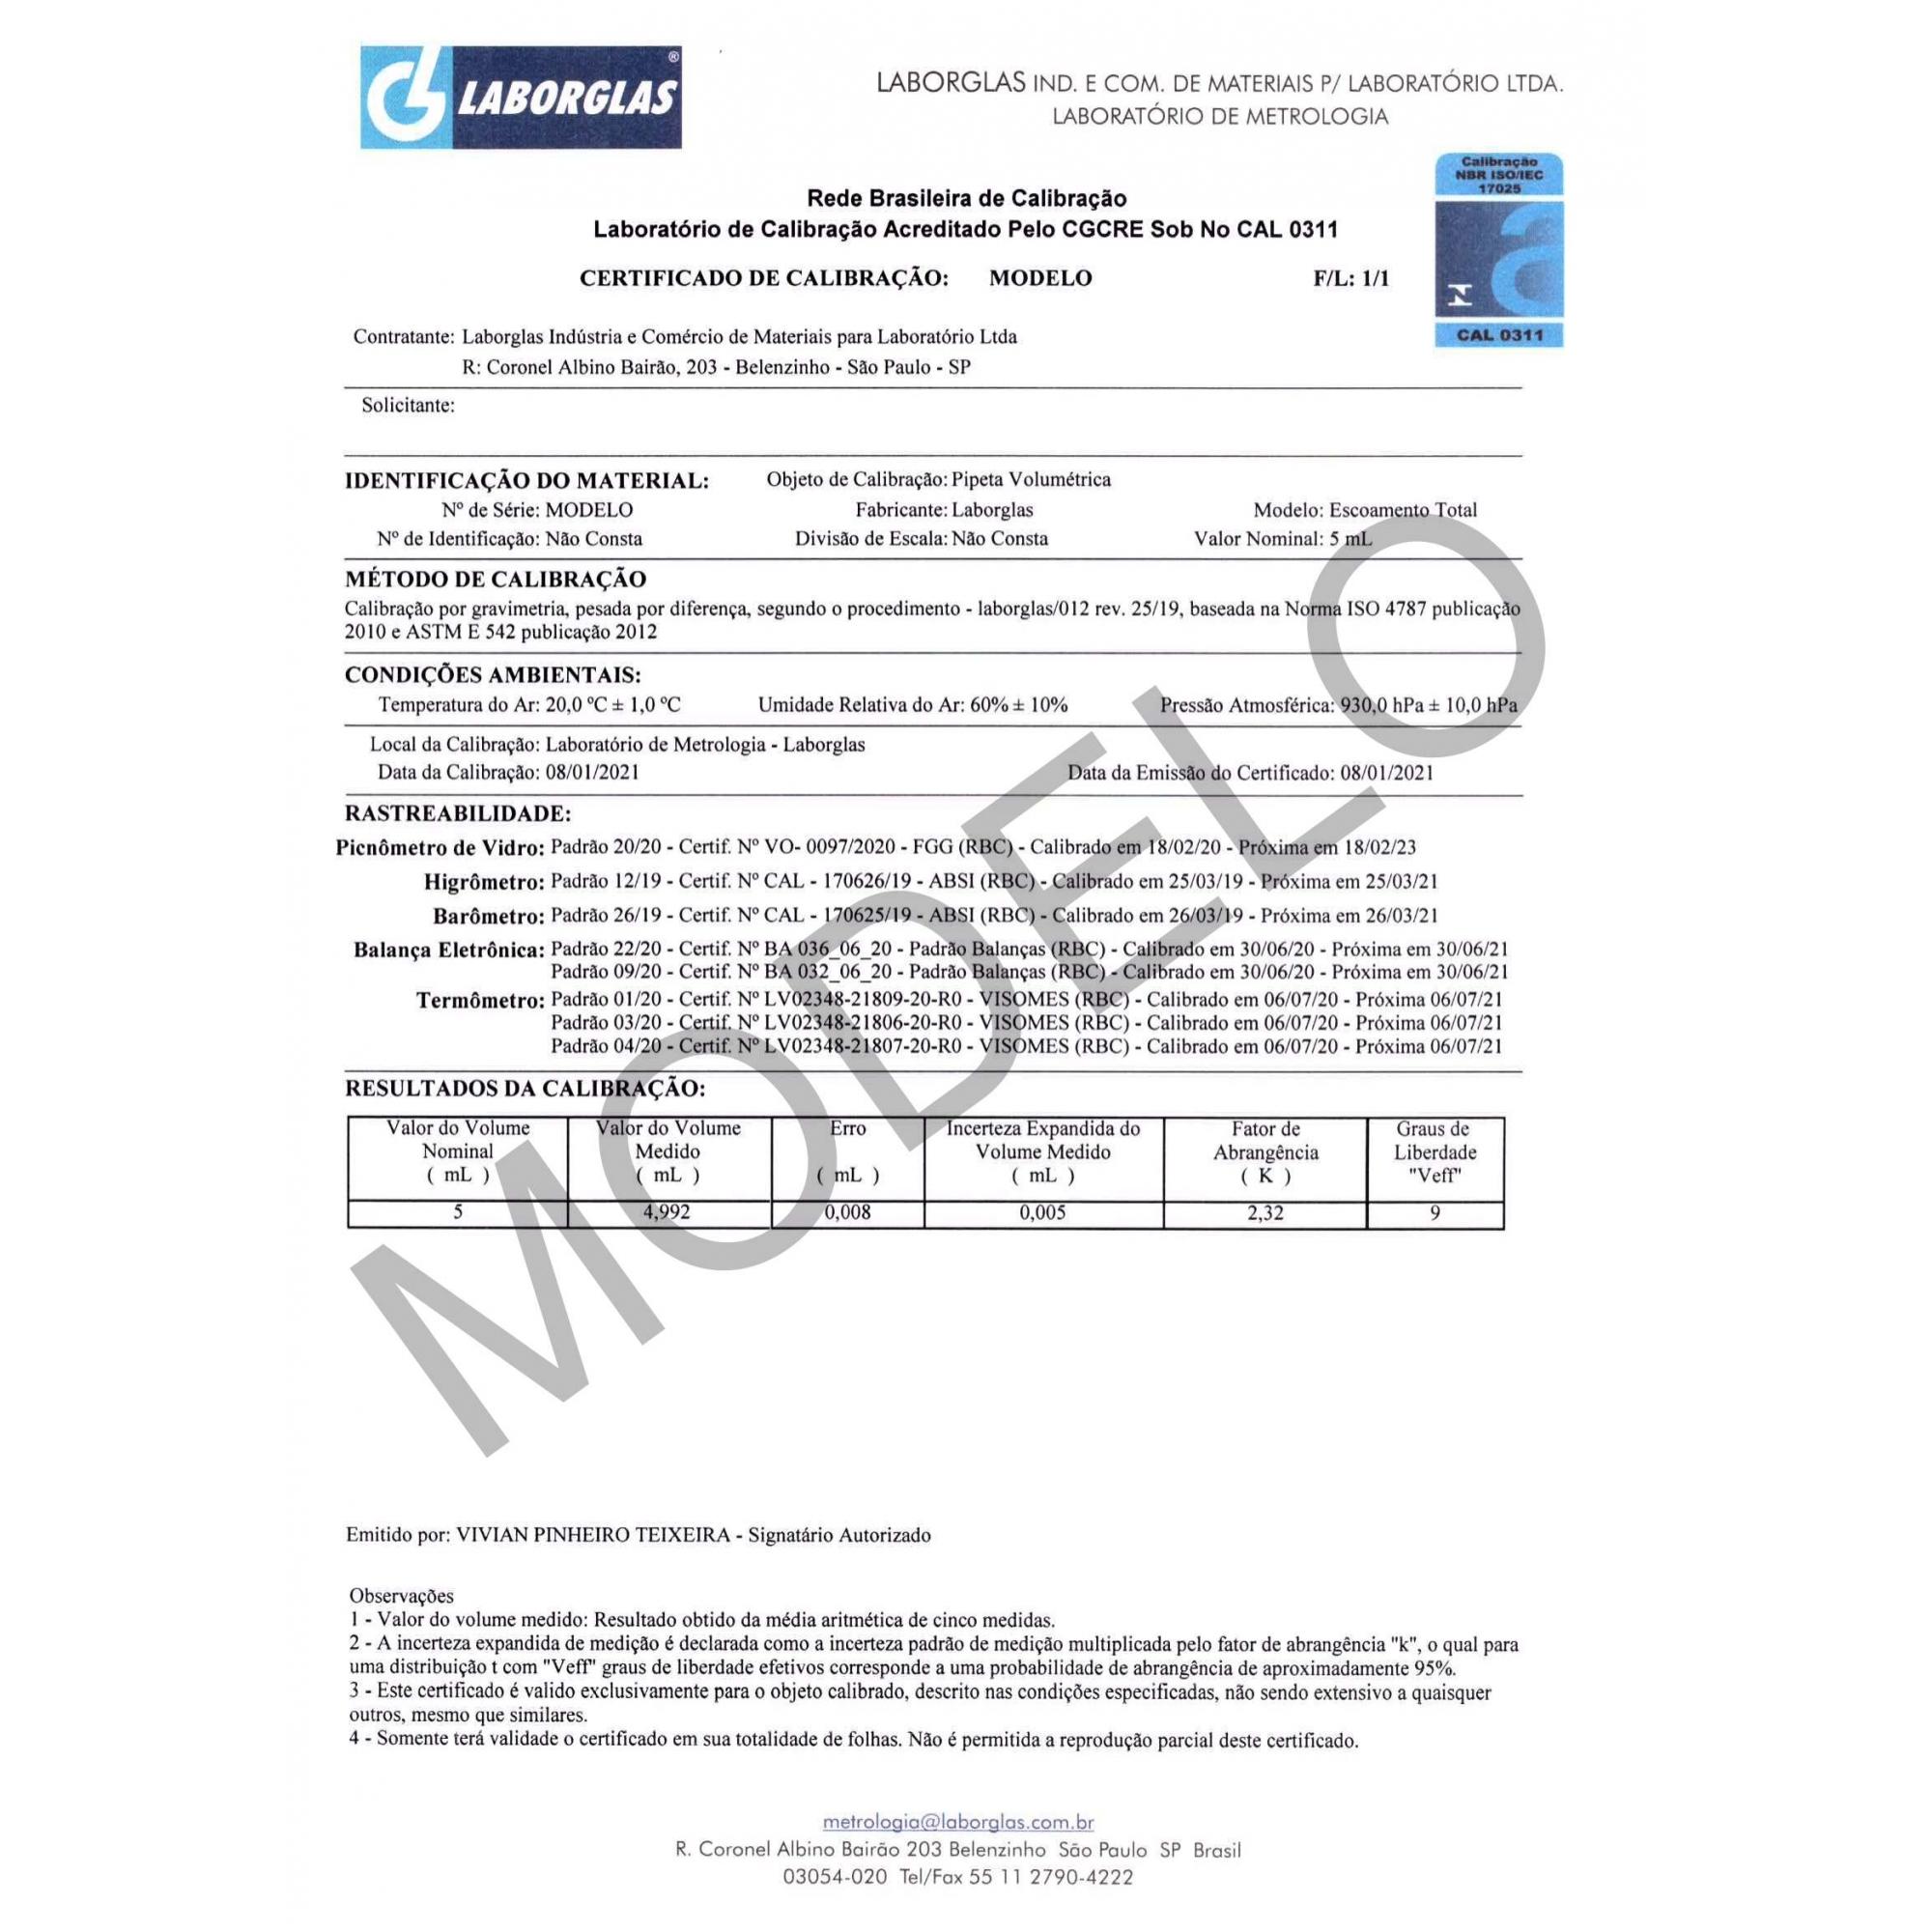 PIPETA VOLUMÉTRICA ESGOTAMENTO TOTAL 1 ML CERTIFICADO RBC - Laborglas - Cód. 9433702-R